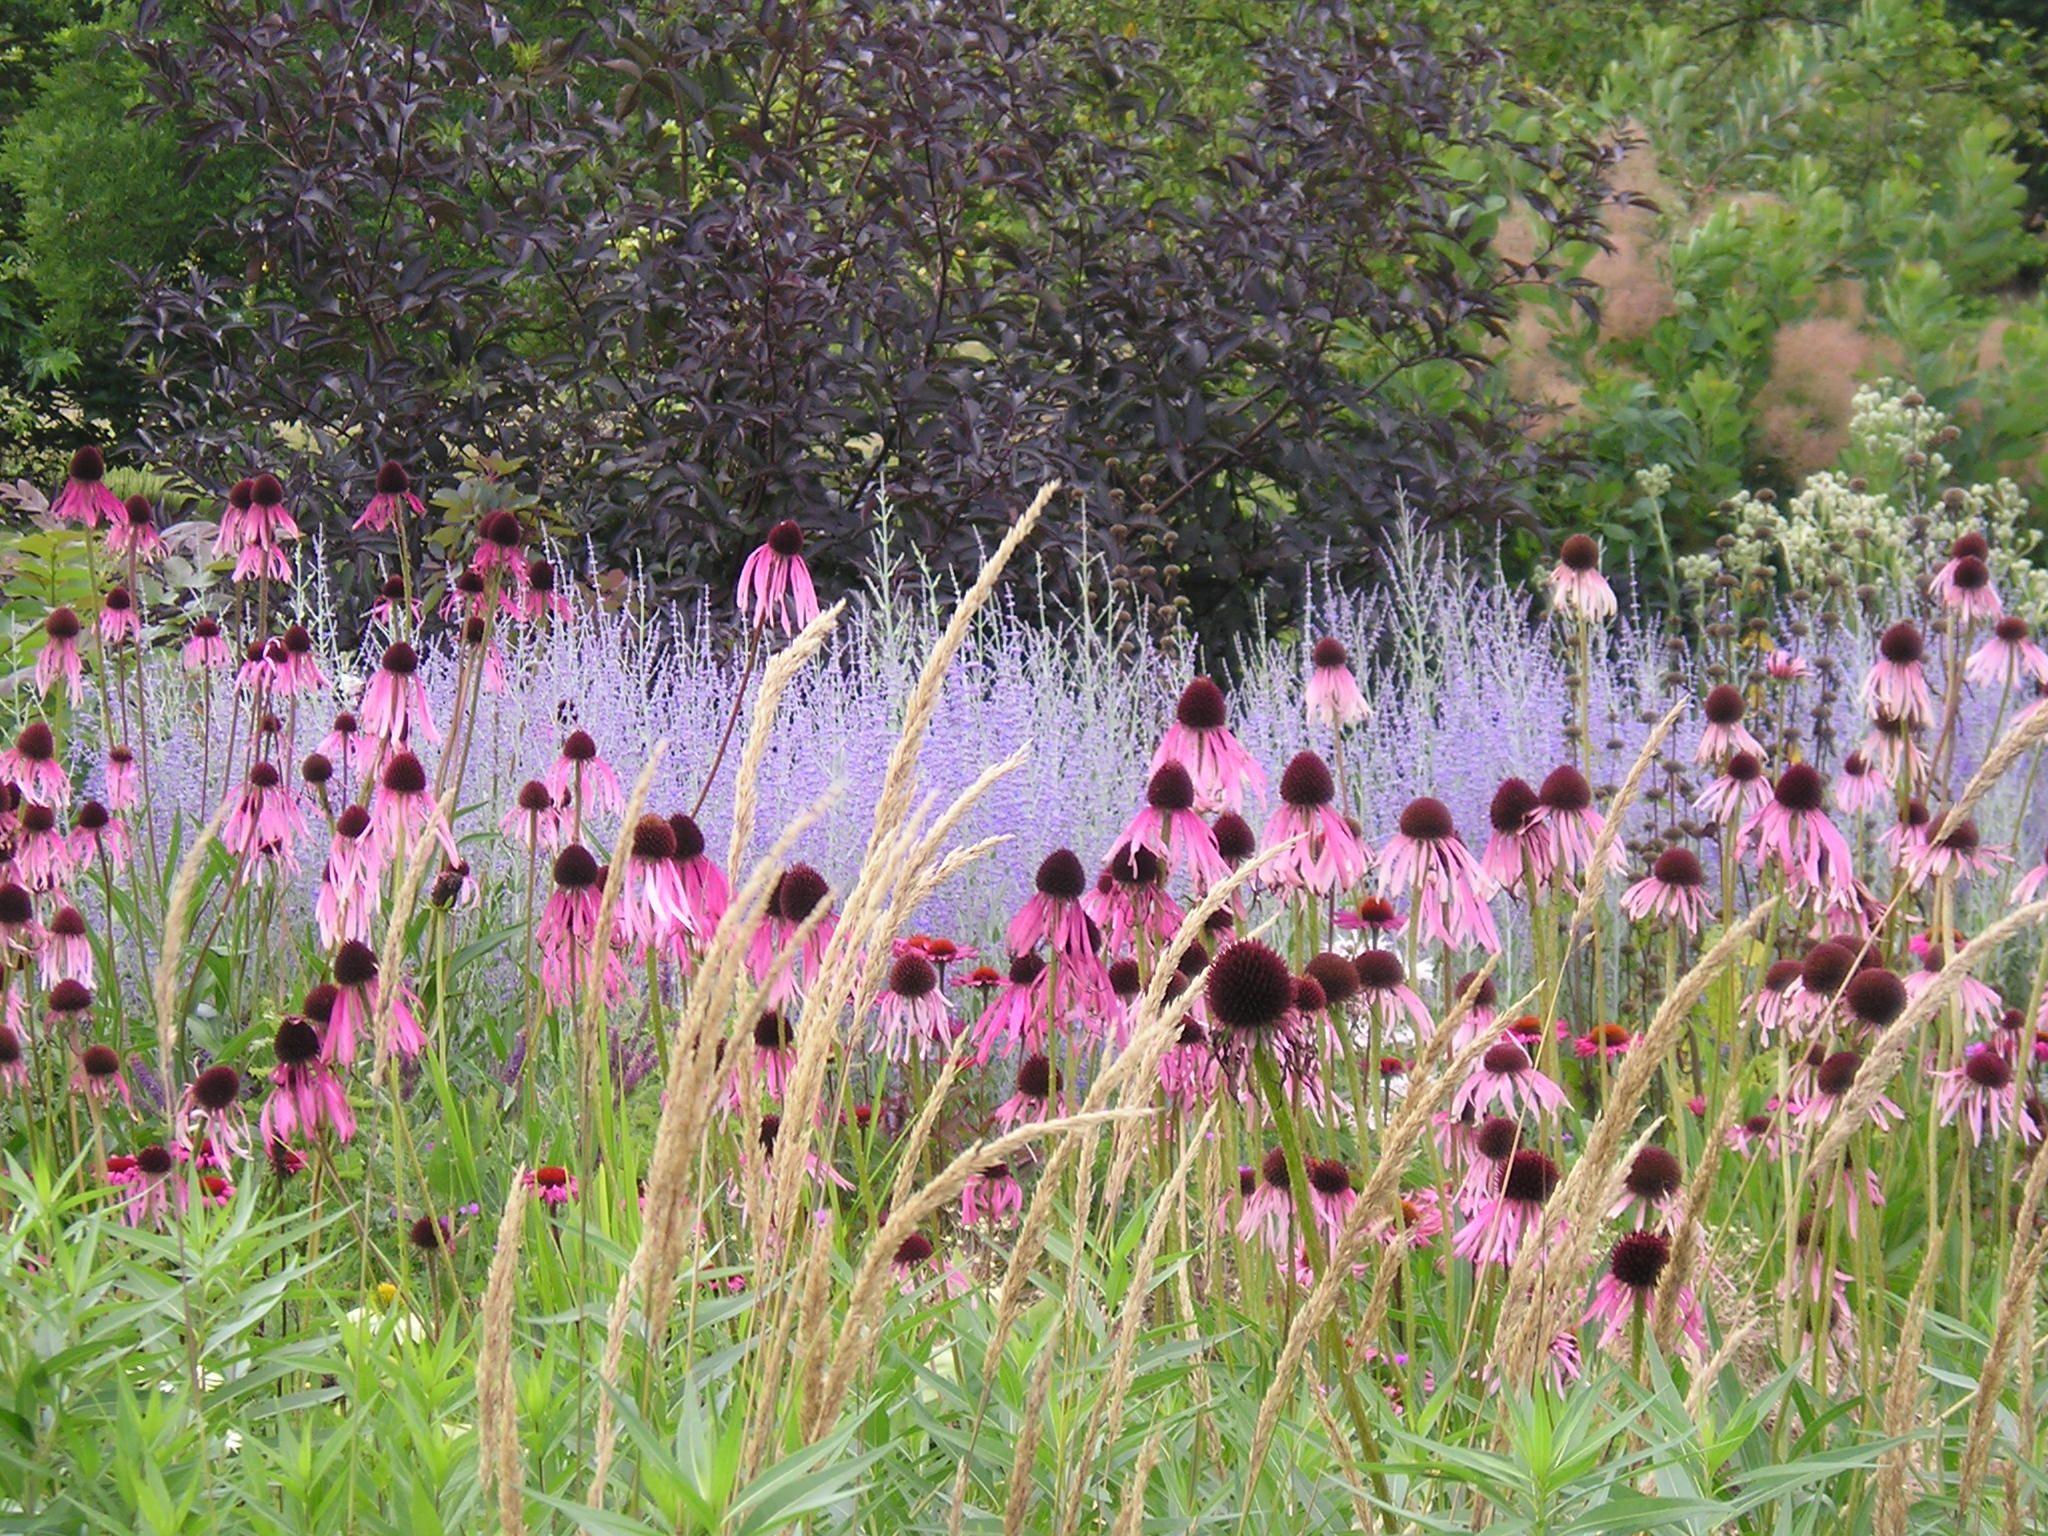 Achillea piet oudolf google search landscaping for Piet oudolf pflanzen